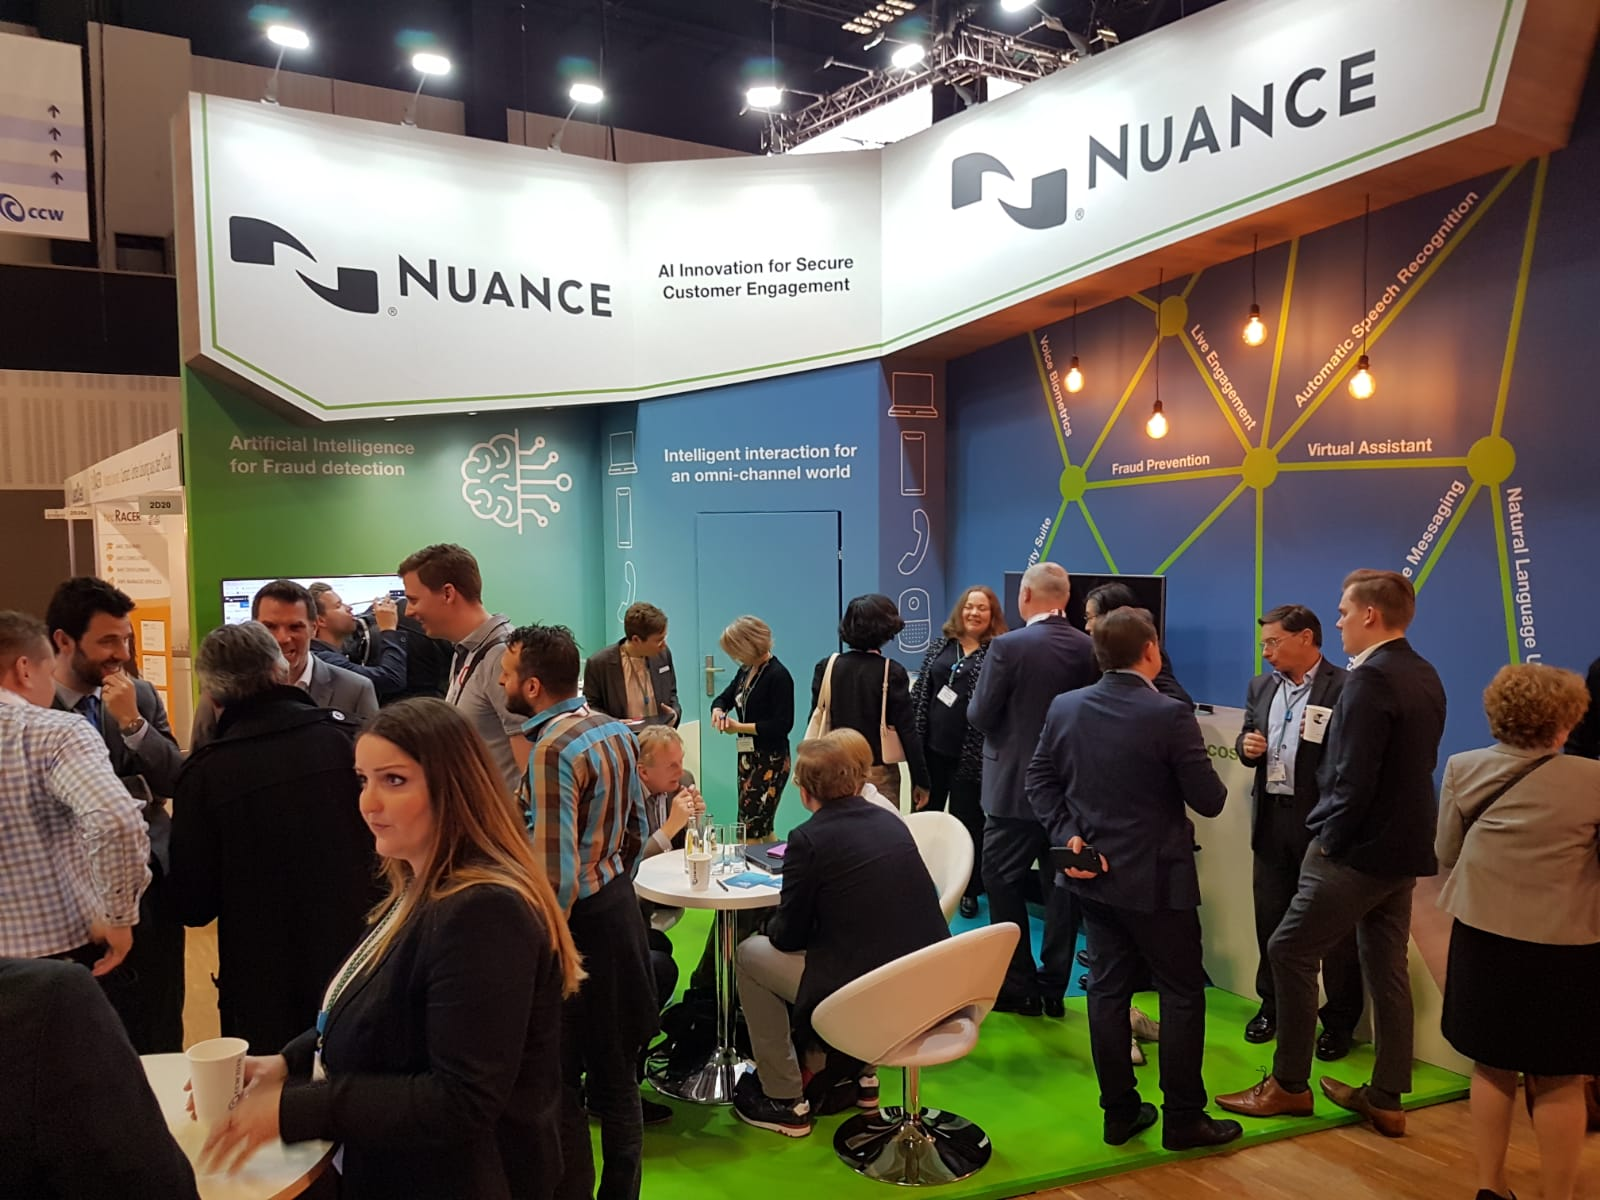 Creative stand design for Nuance at Berlin Estrel Congress Centre